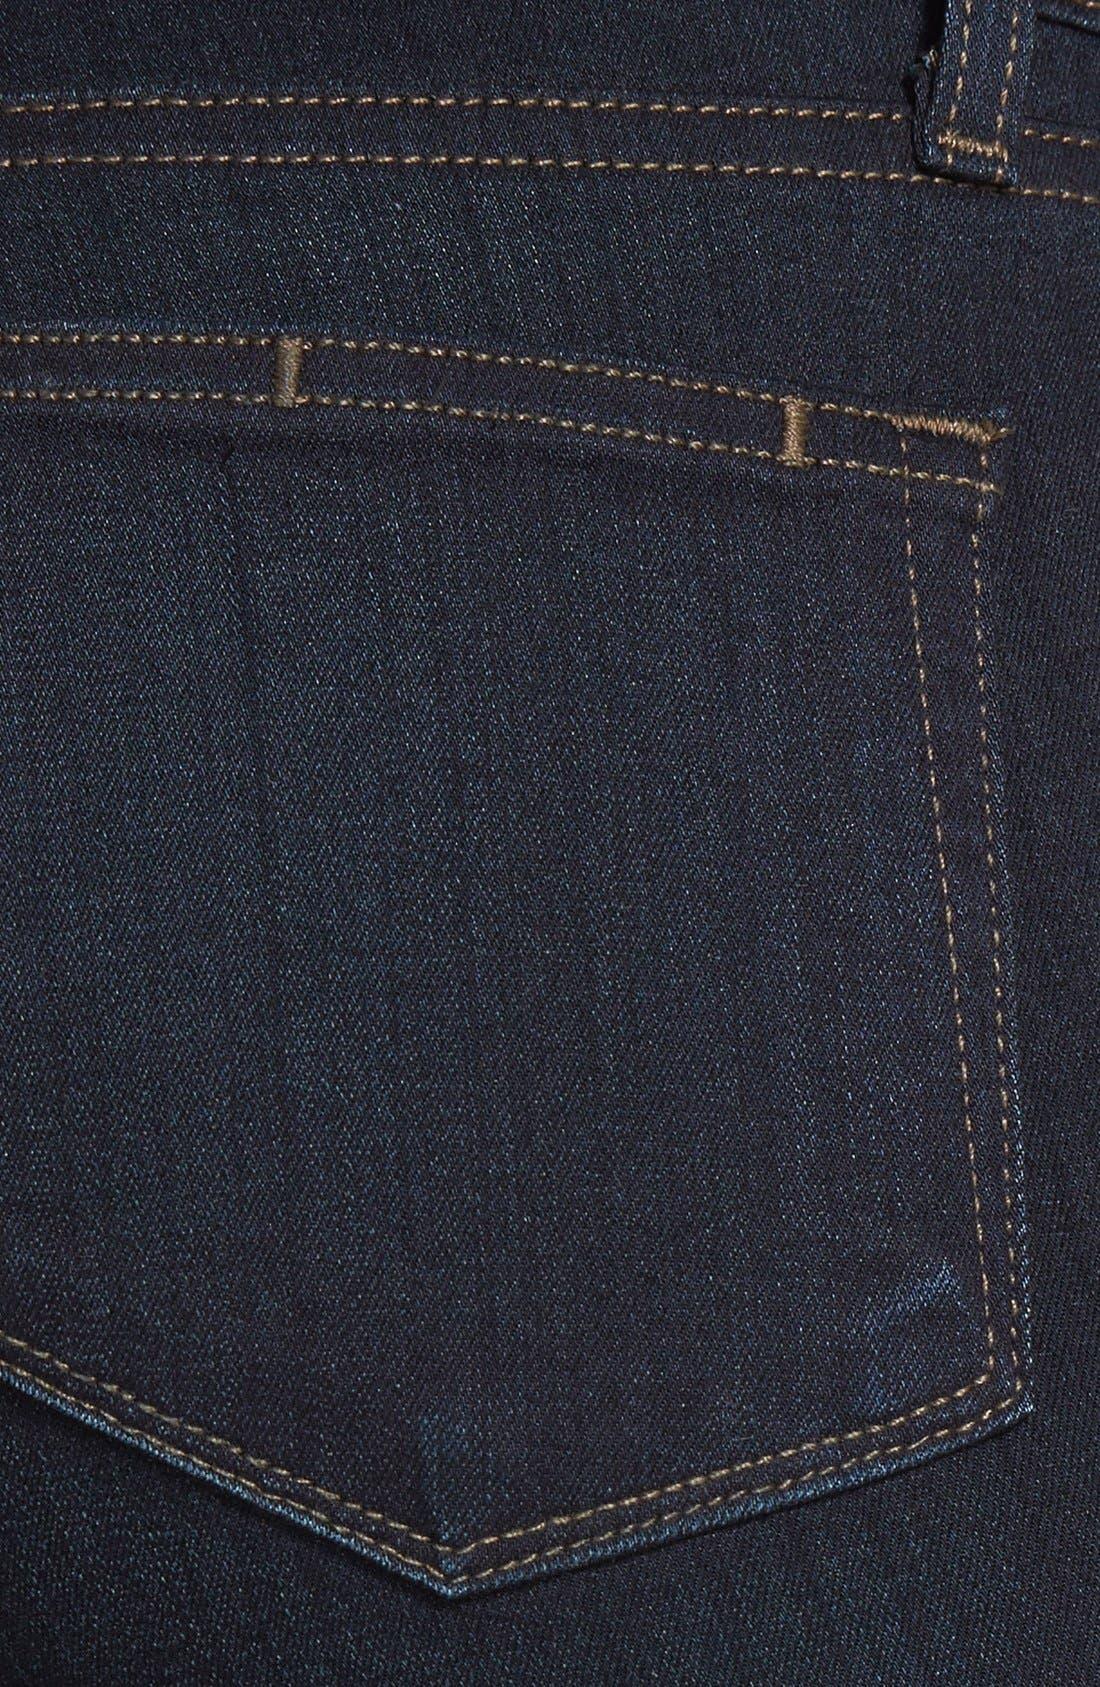 Transcend - Hoxton High Waist Straight Jeans,                             Alternate thumbnail 3, color,                             MONA